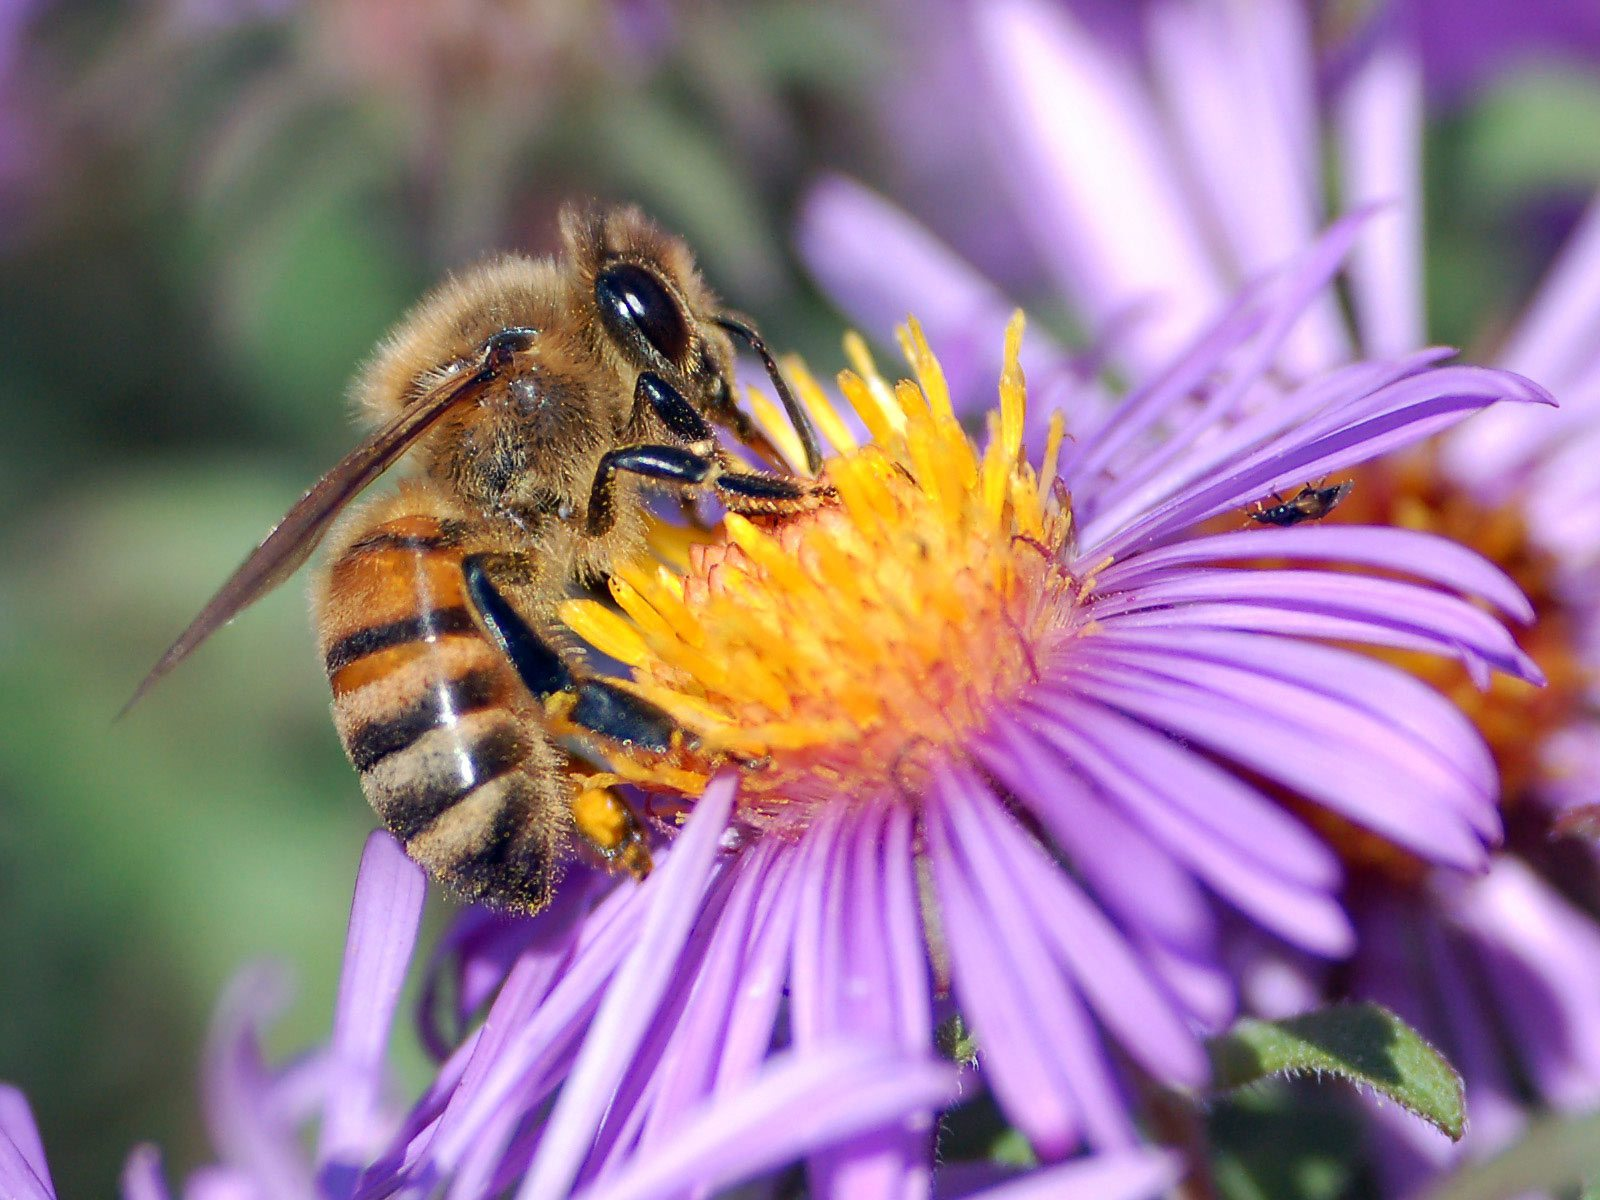 Bee sitting on flower